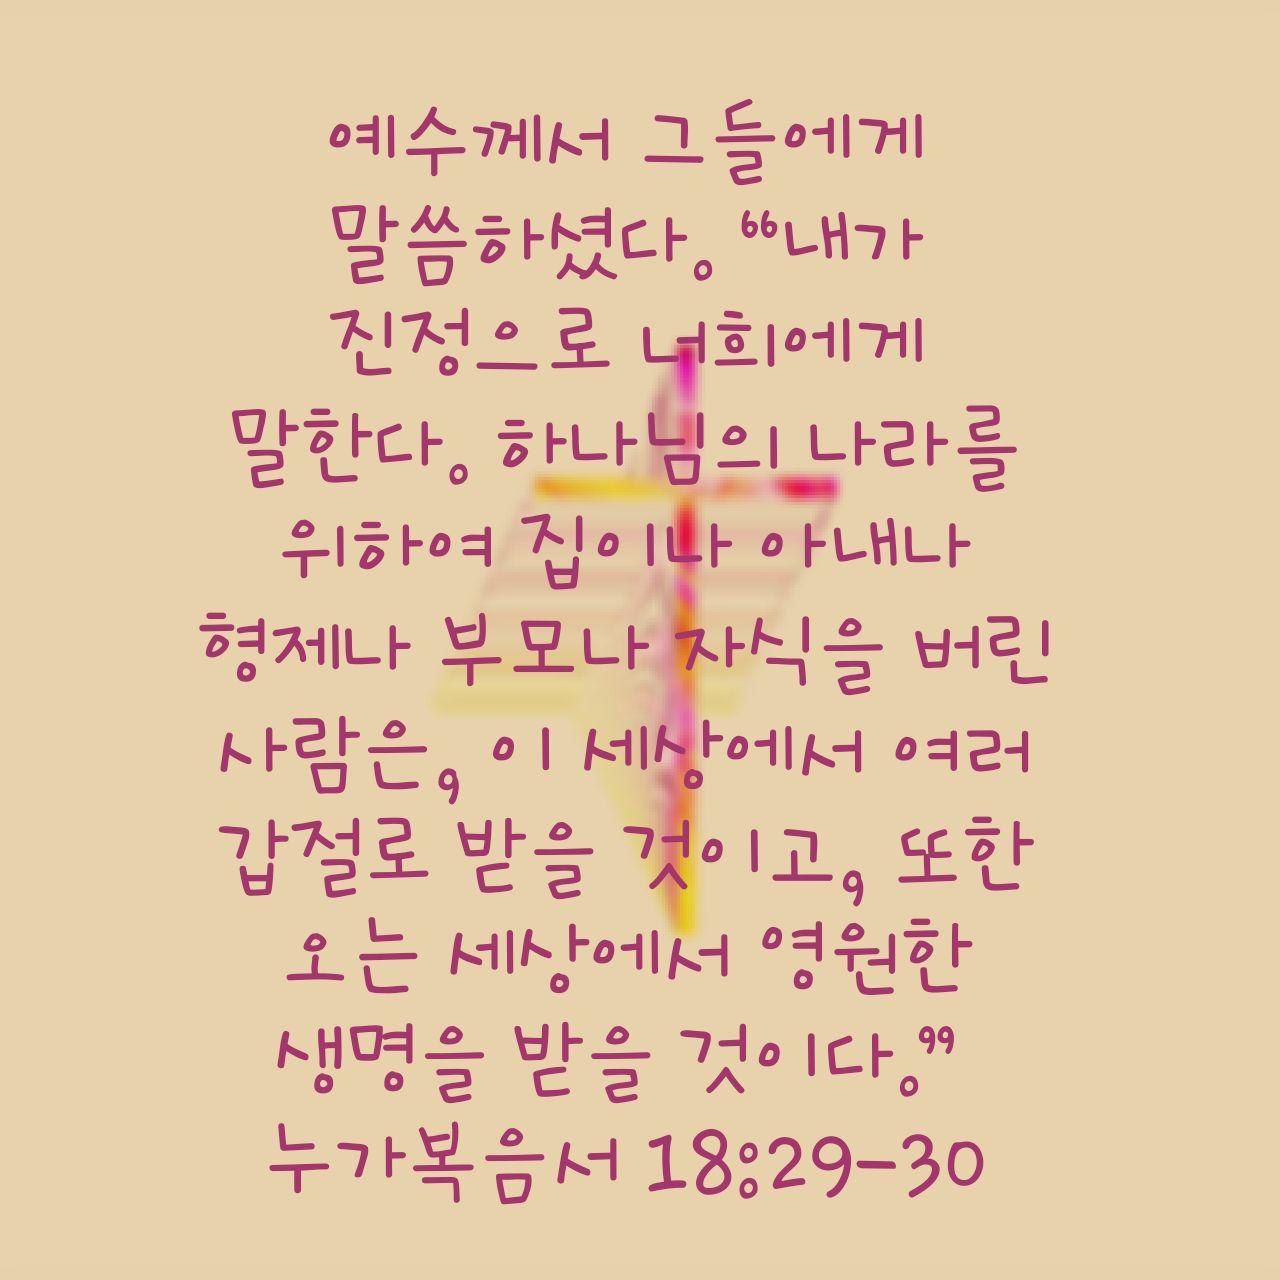 1632549173846_verse_image.jpg